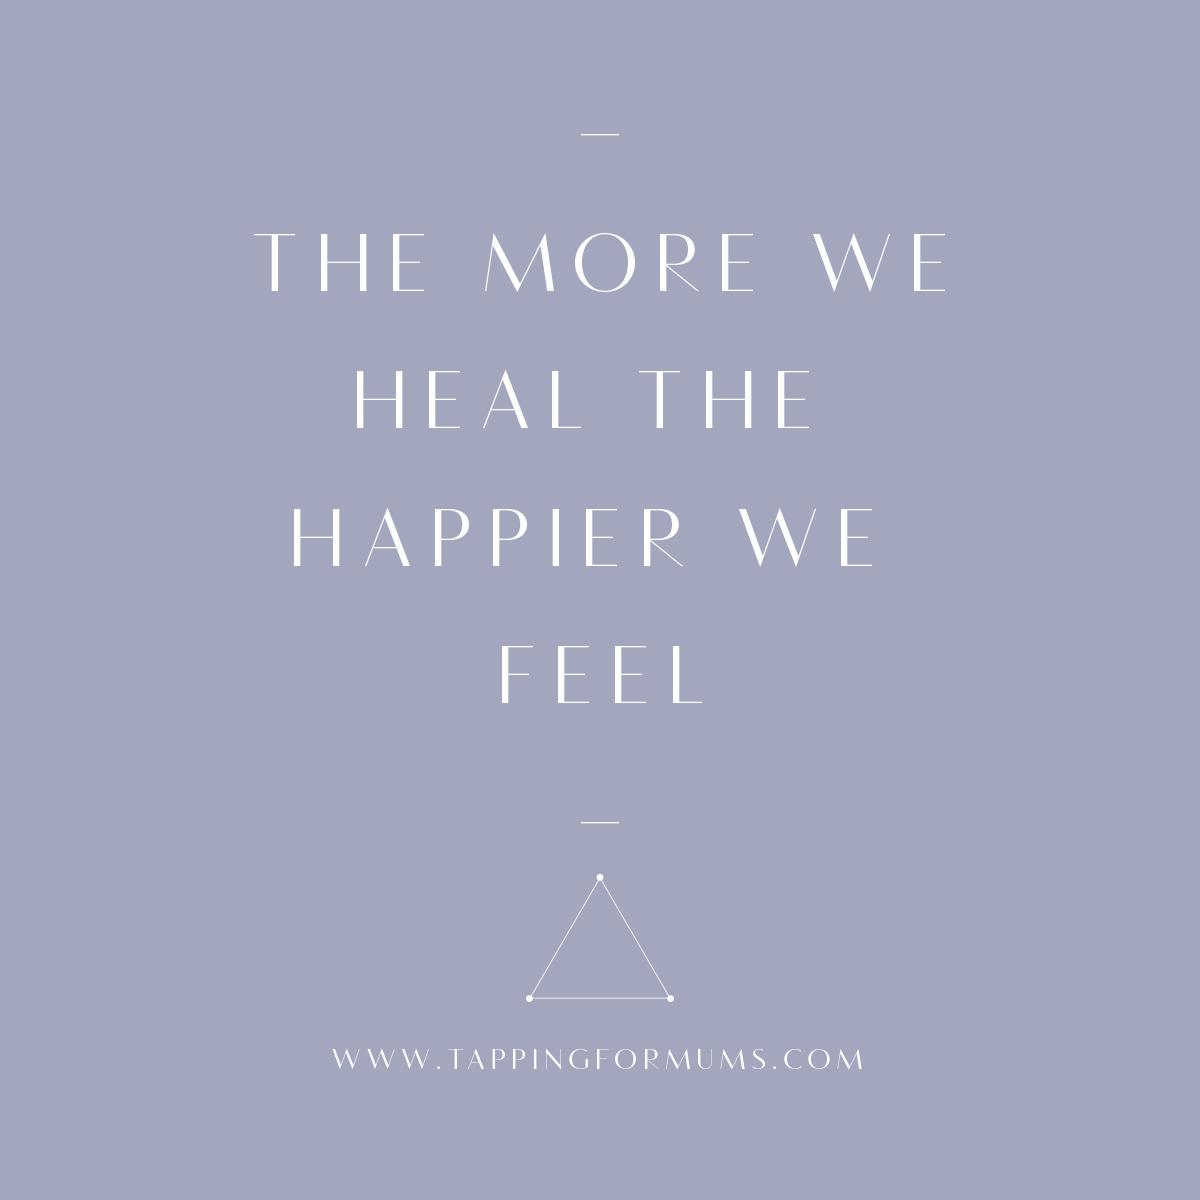 The-more-we-feel-the-happier-we-feel.jpg